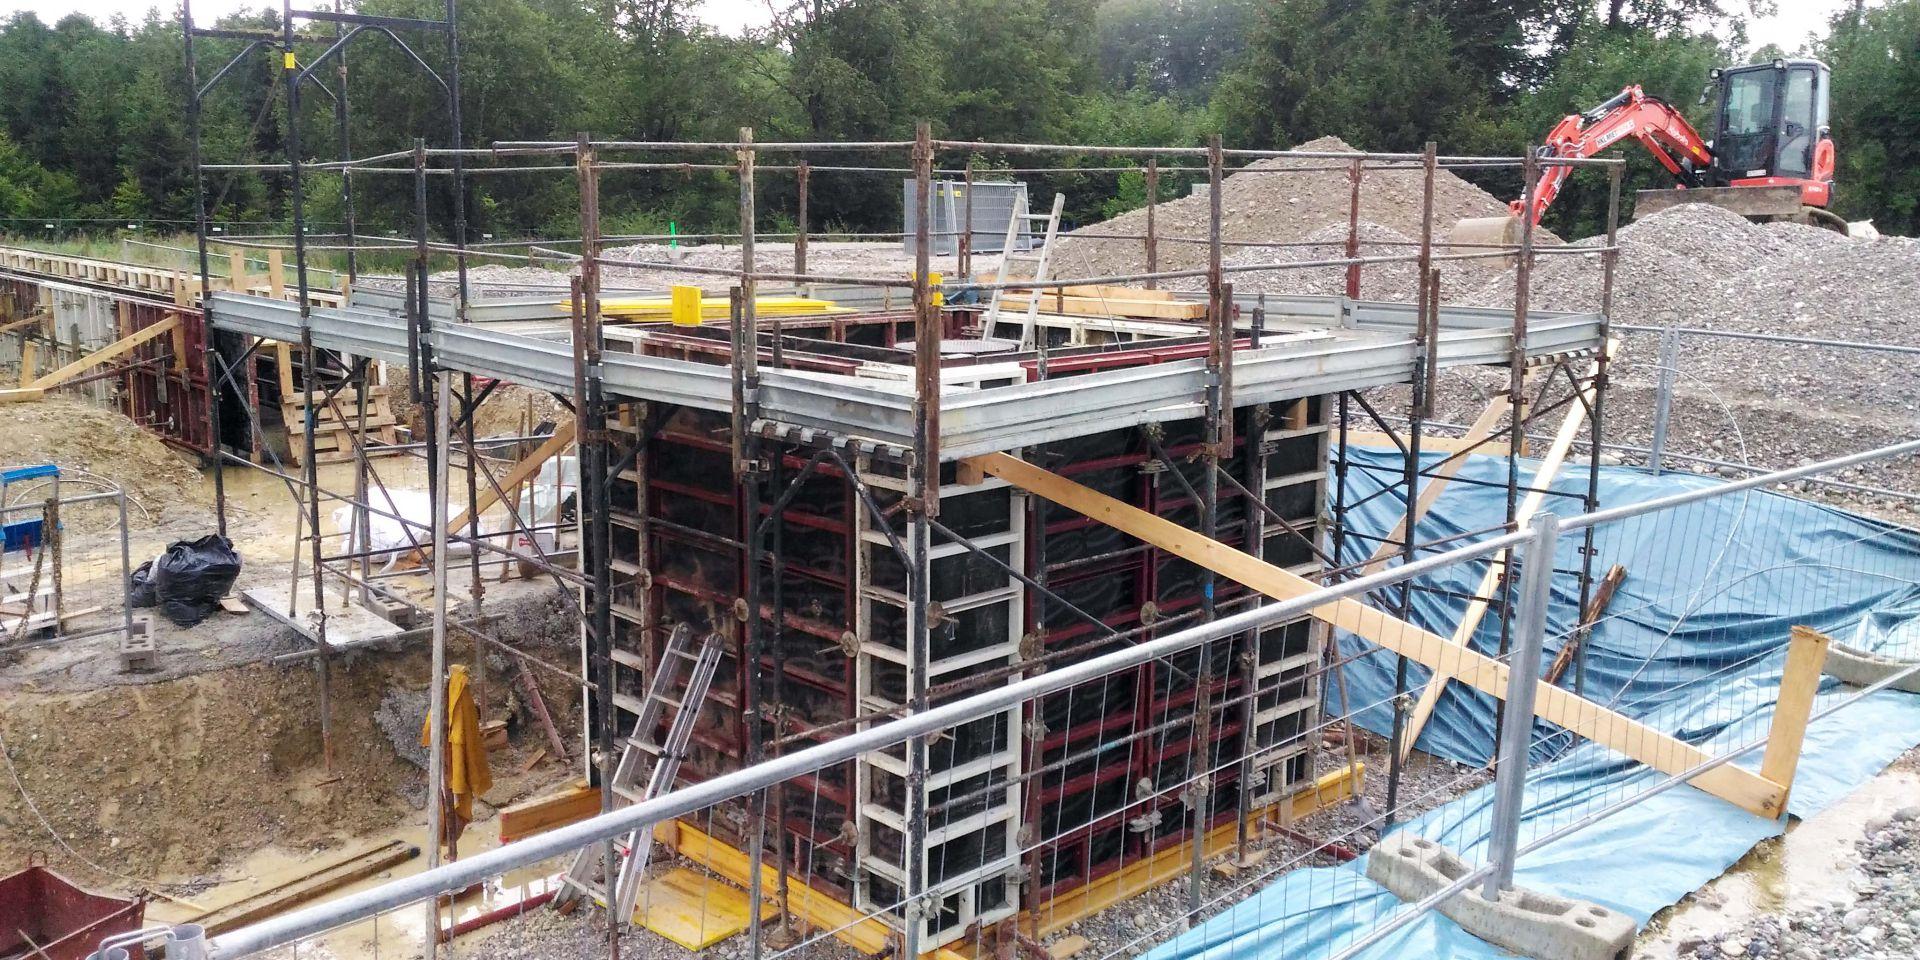 Impianto geotermico di profondità, Weilheim (D)